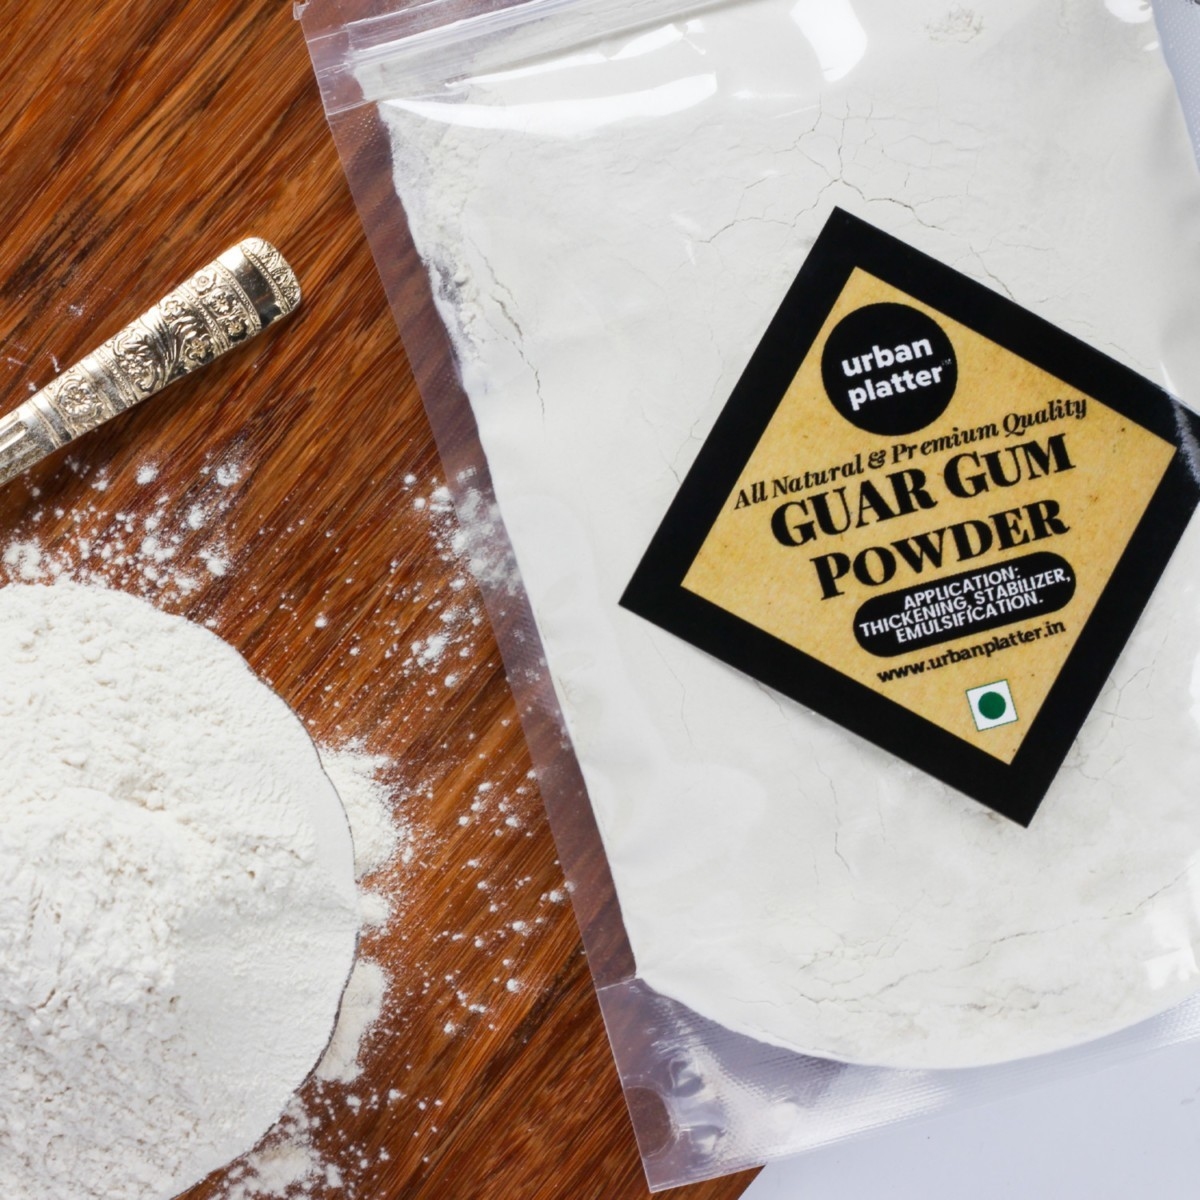 Urban Platter Guar Gum Powder, 1Kg (All Natural